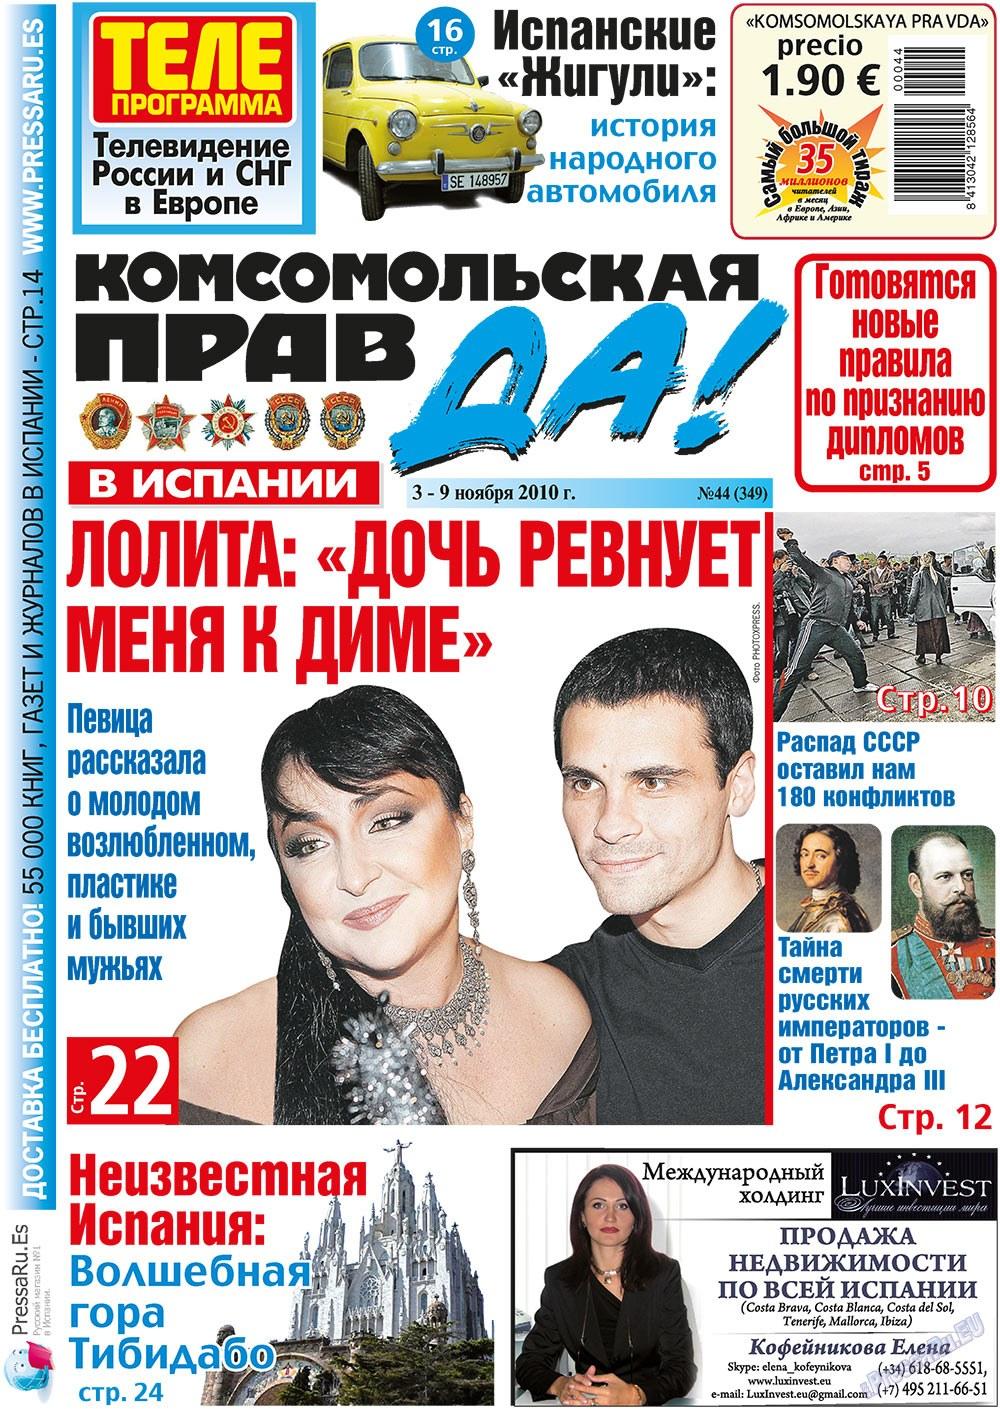 КП Испания (газета). 2010 год, номер 44, стр. 1